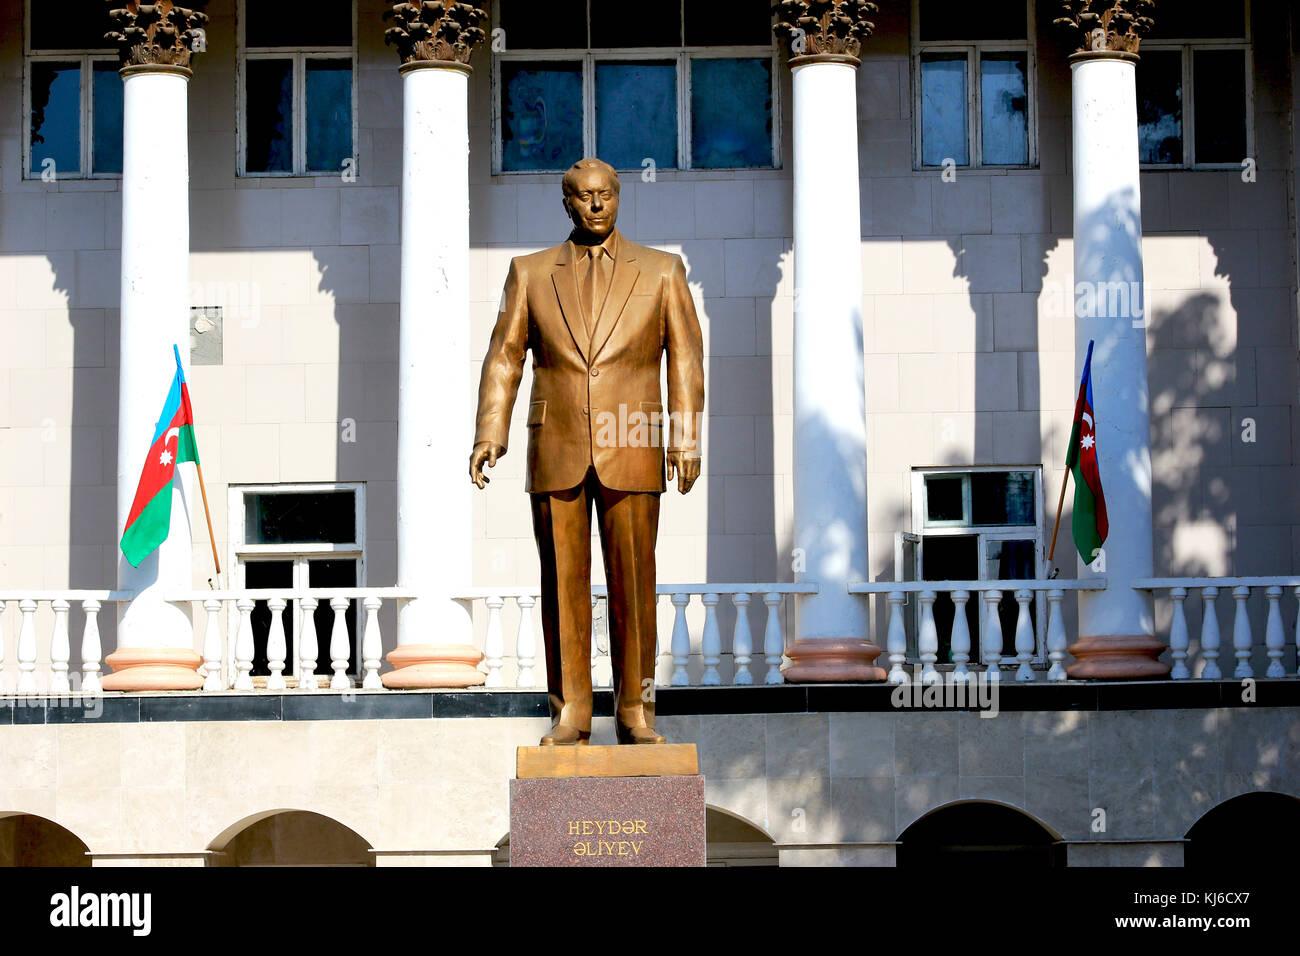 Heydar Aliyev Monument  in Ivanovka village of Azerbaijan Azerbaijan - Stock Image